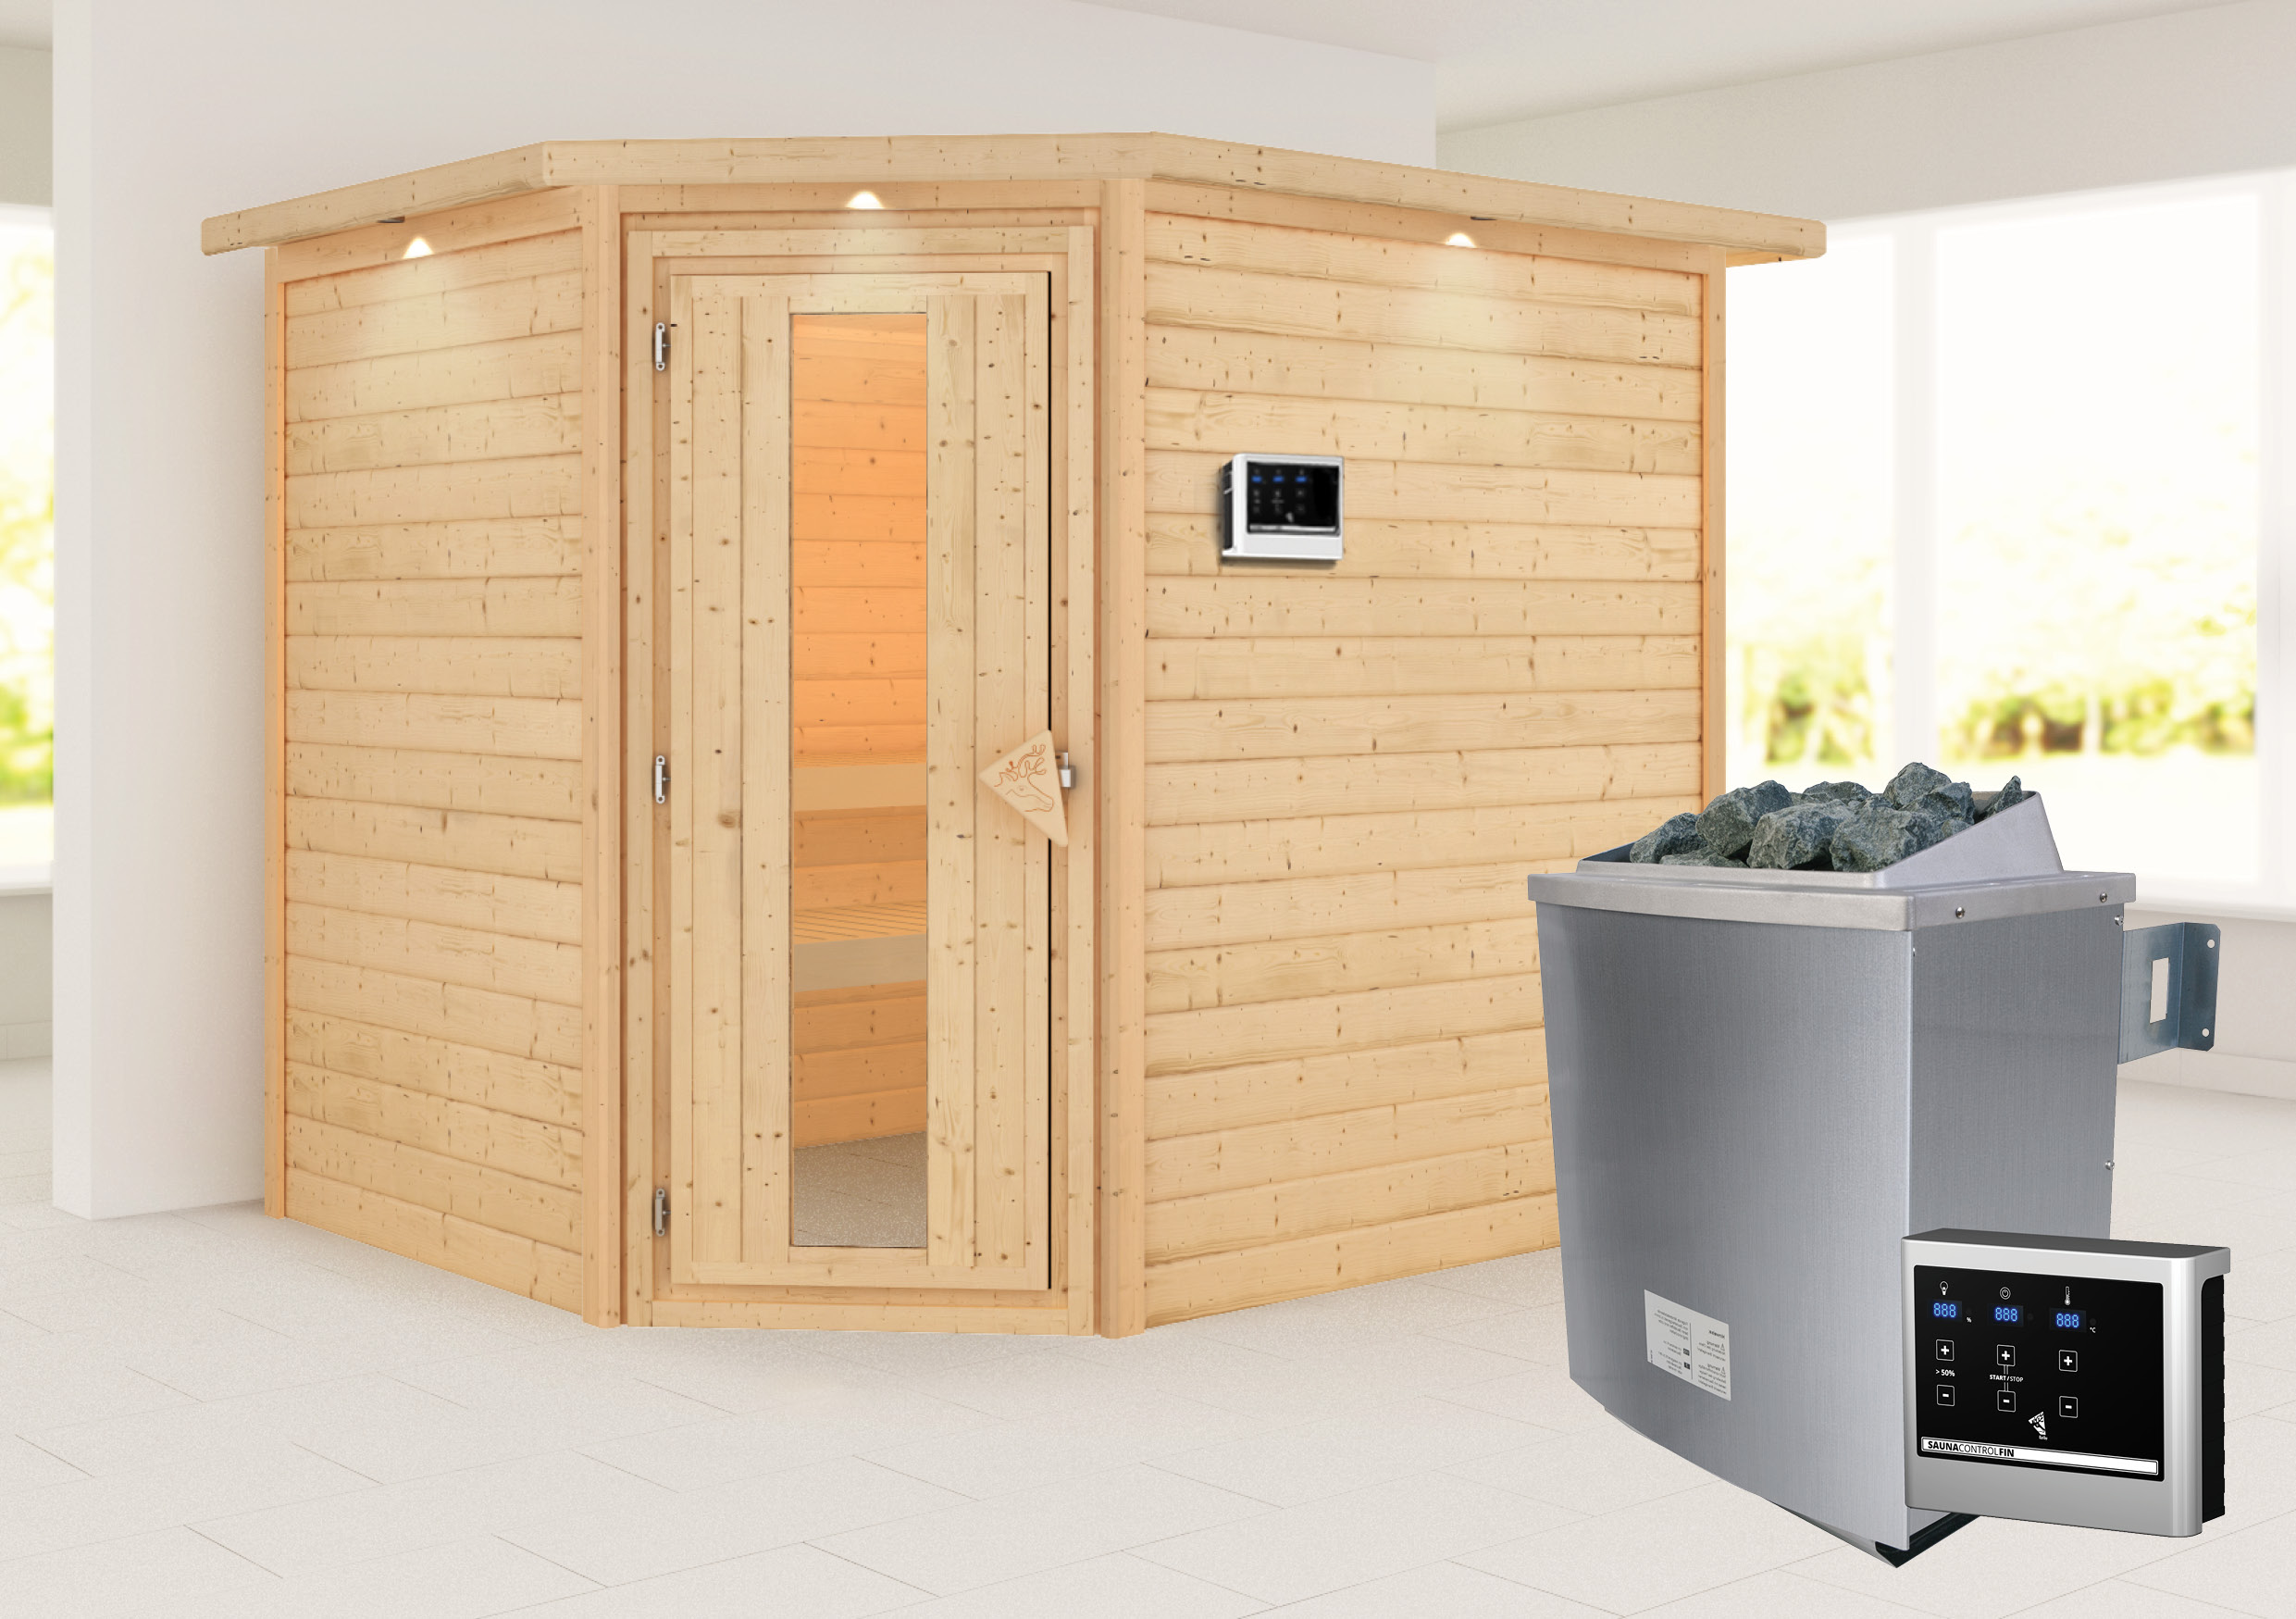 Woodfeeling Sauna Lisa 38mm Kranz Ofen 9kW extern Tür Holz Bild 1